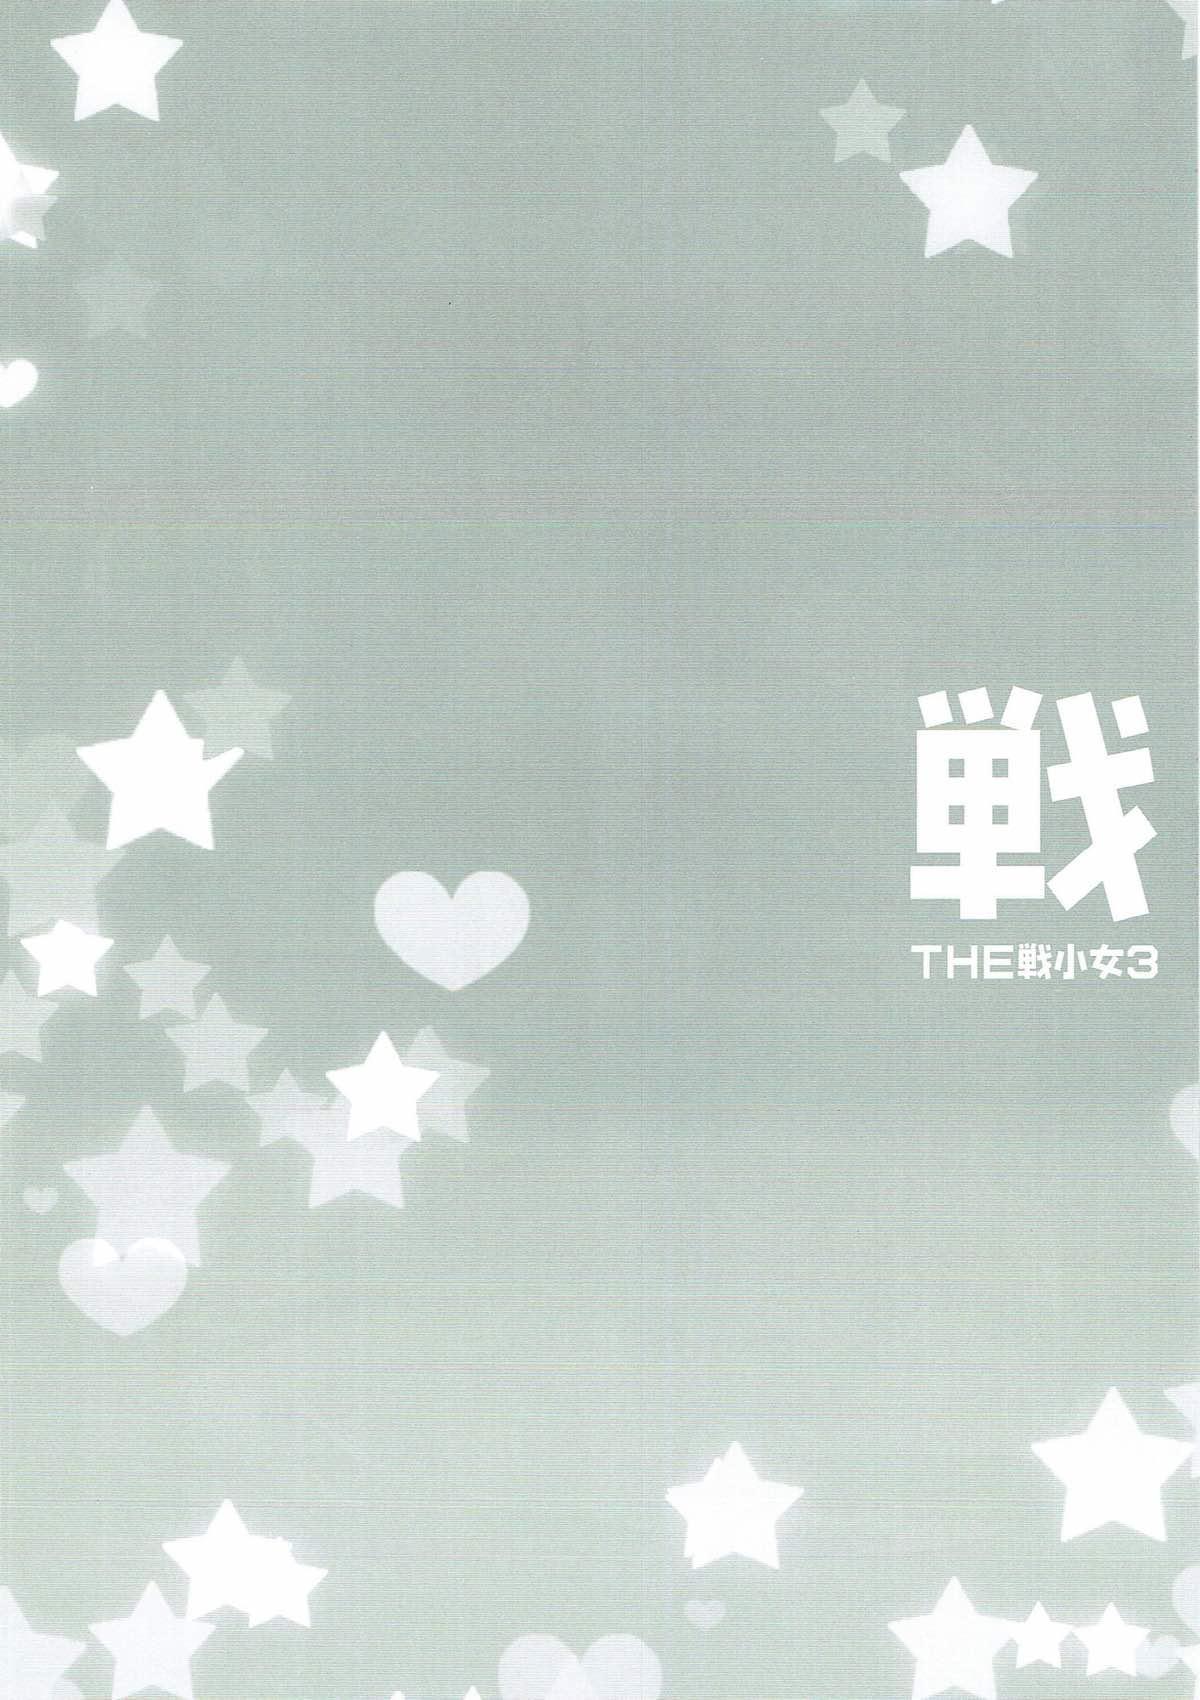 THE Senshoujo 3 10